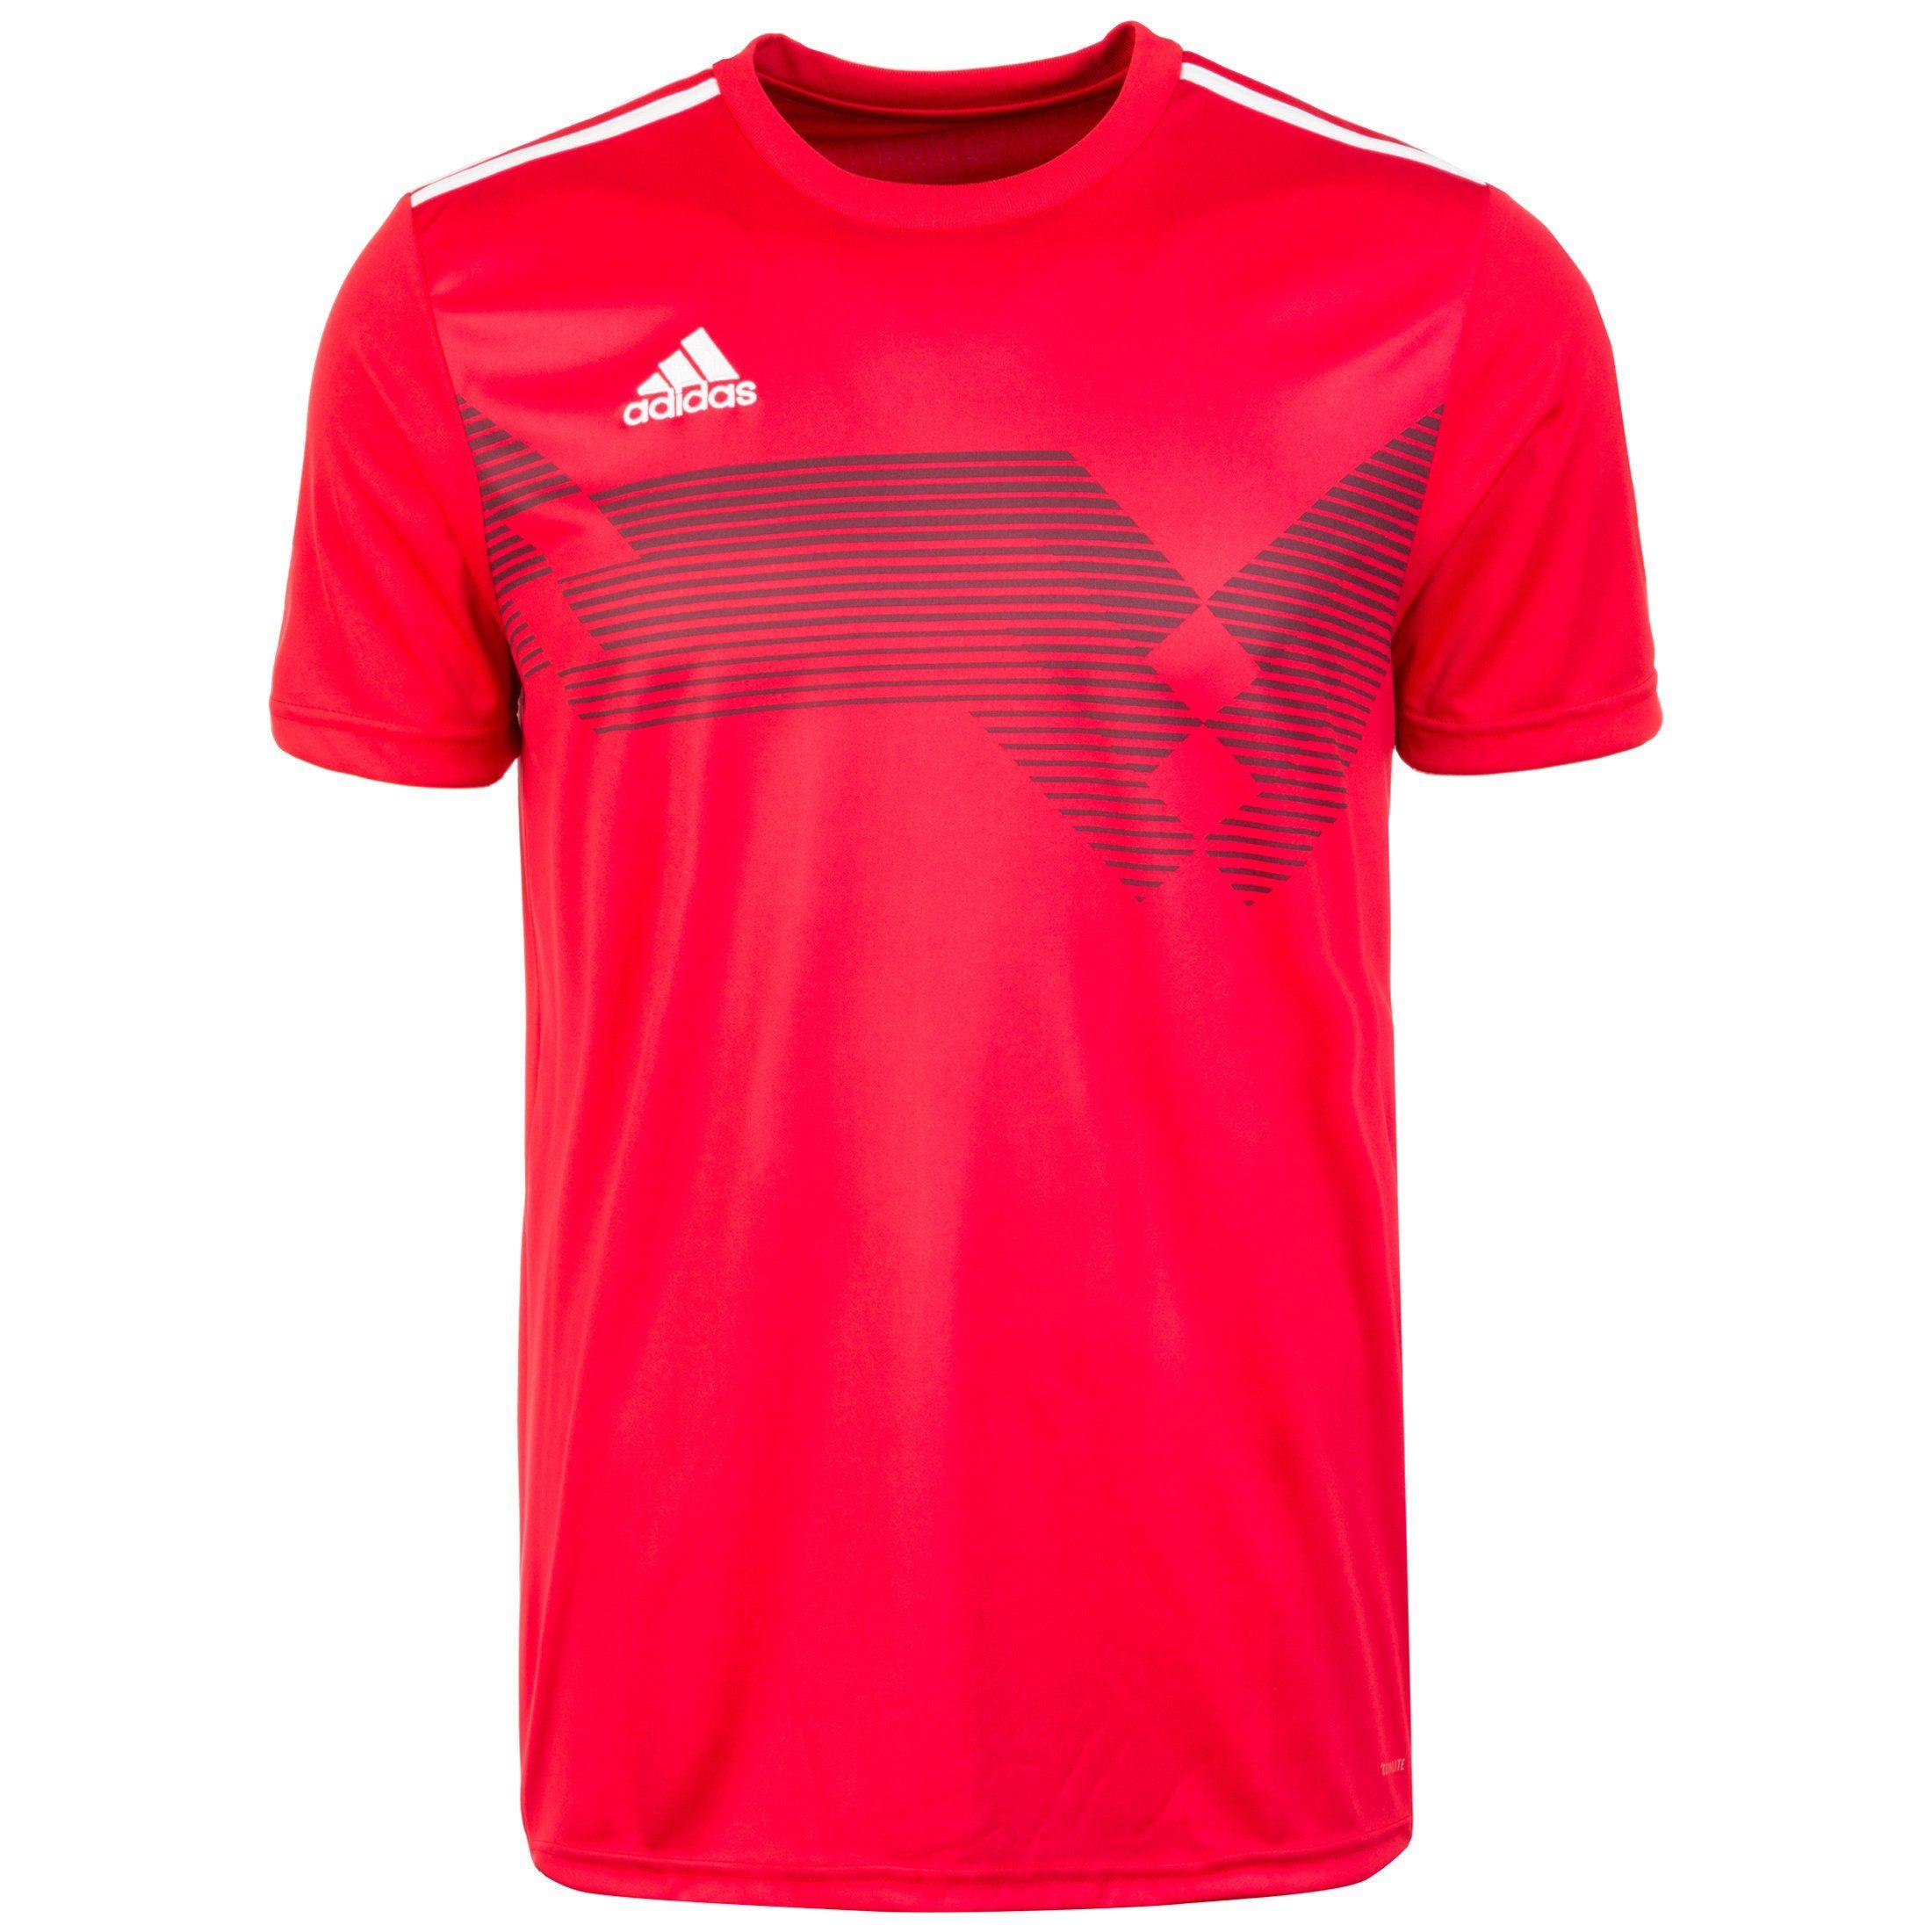 adidas Performance Fußballtrikot Campeon 19 | Sportbekleidung > Trikots > Fußballtrikots | Rot | Trikot - Jersey - Interlock | Adidas Performance